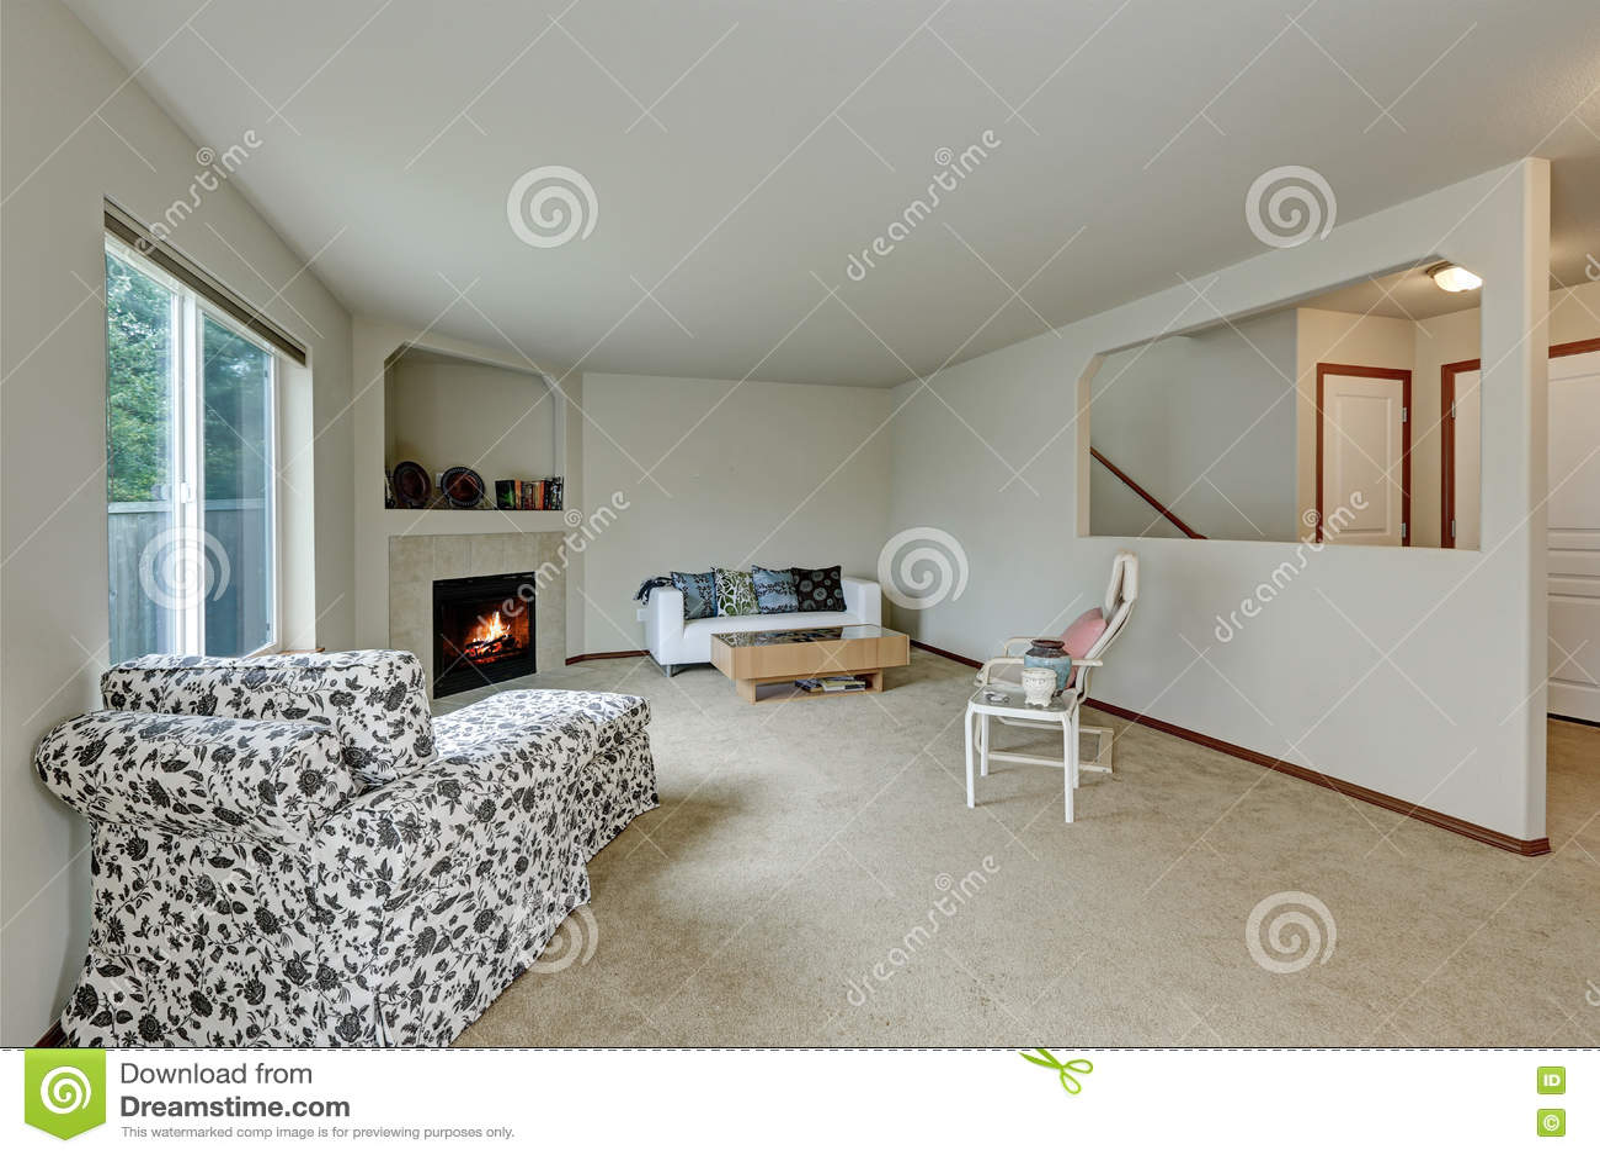 Elegantes Wohnzimmer Stock Images - Download 269 Photos